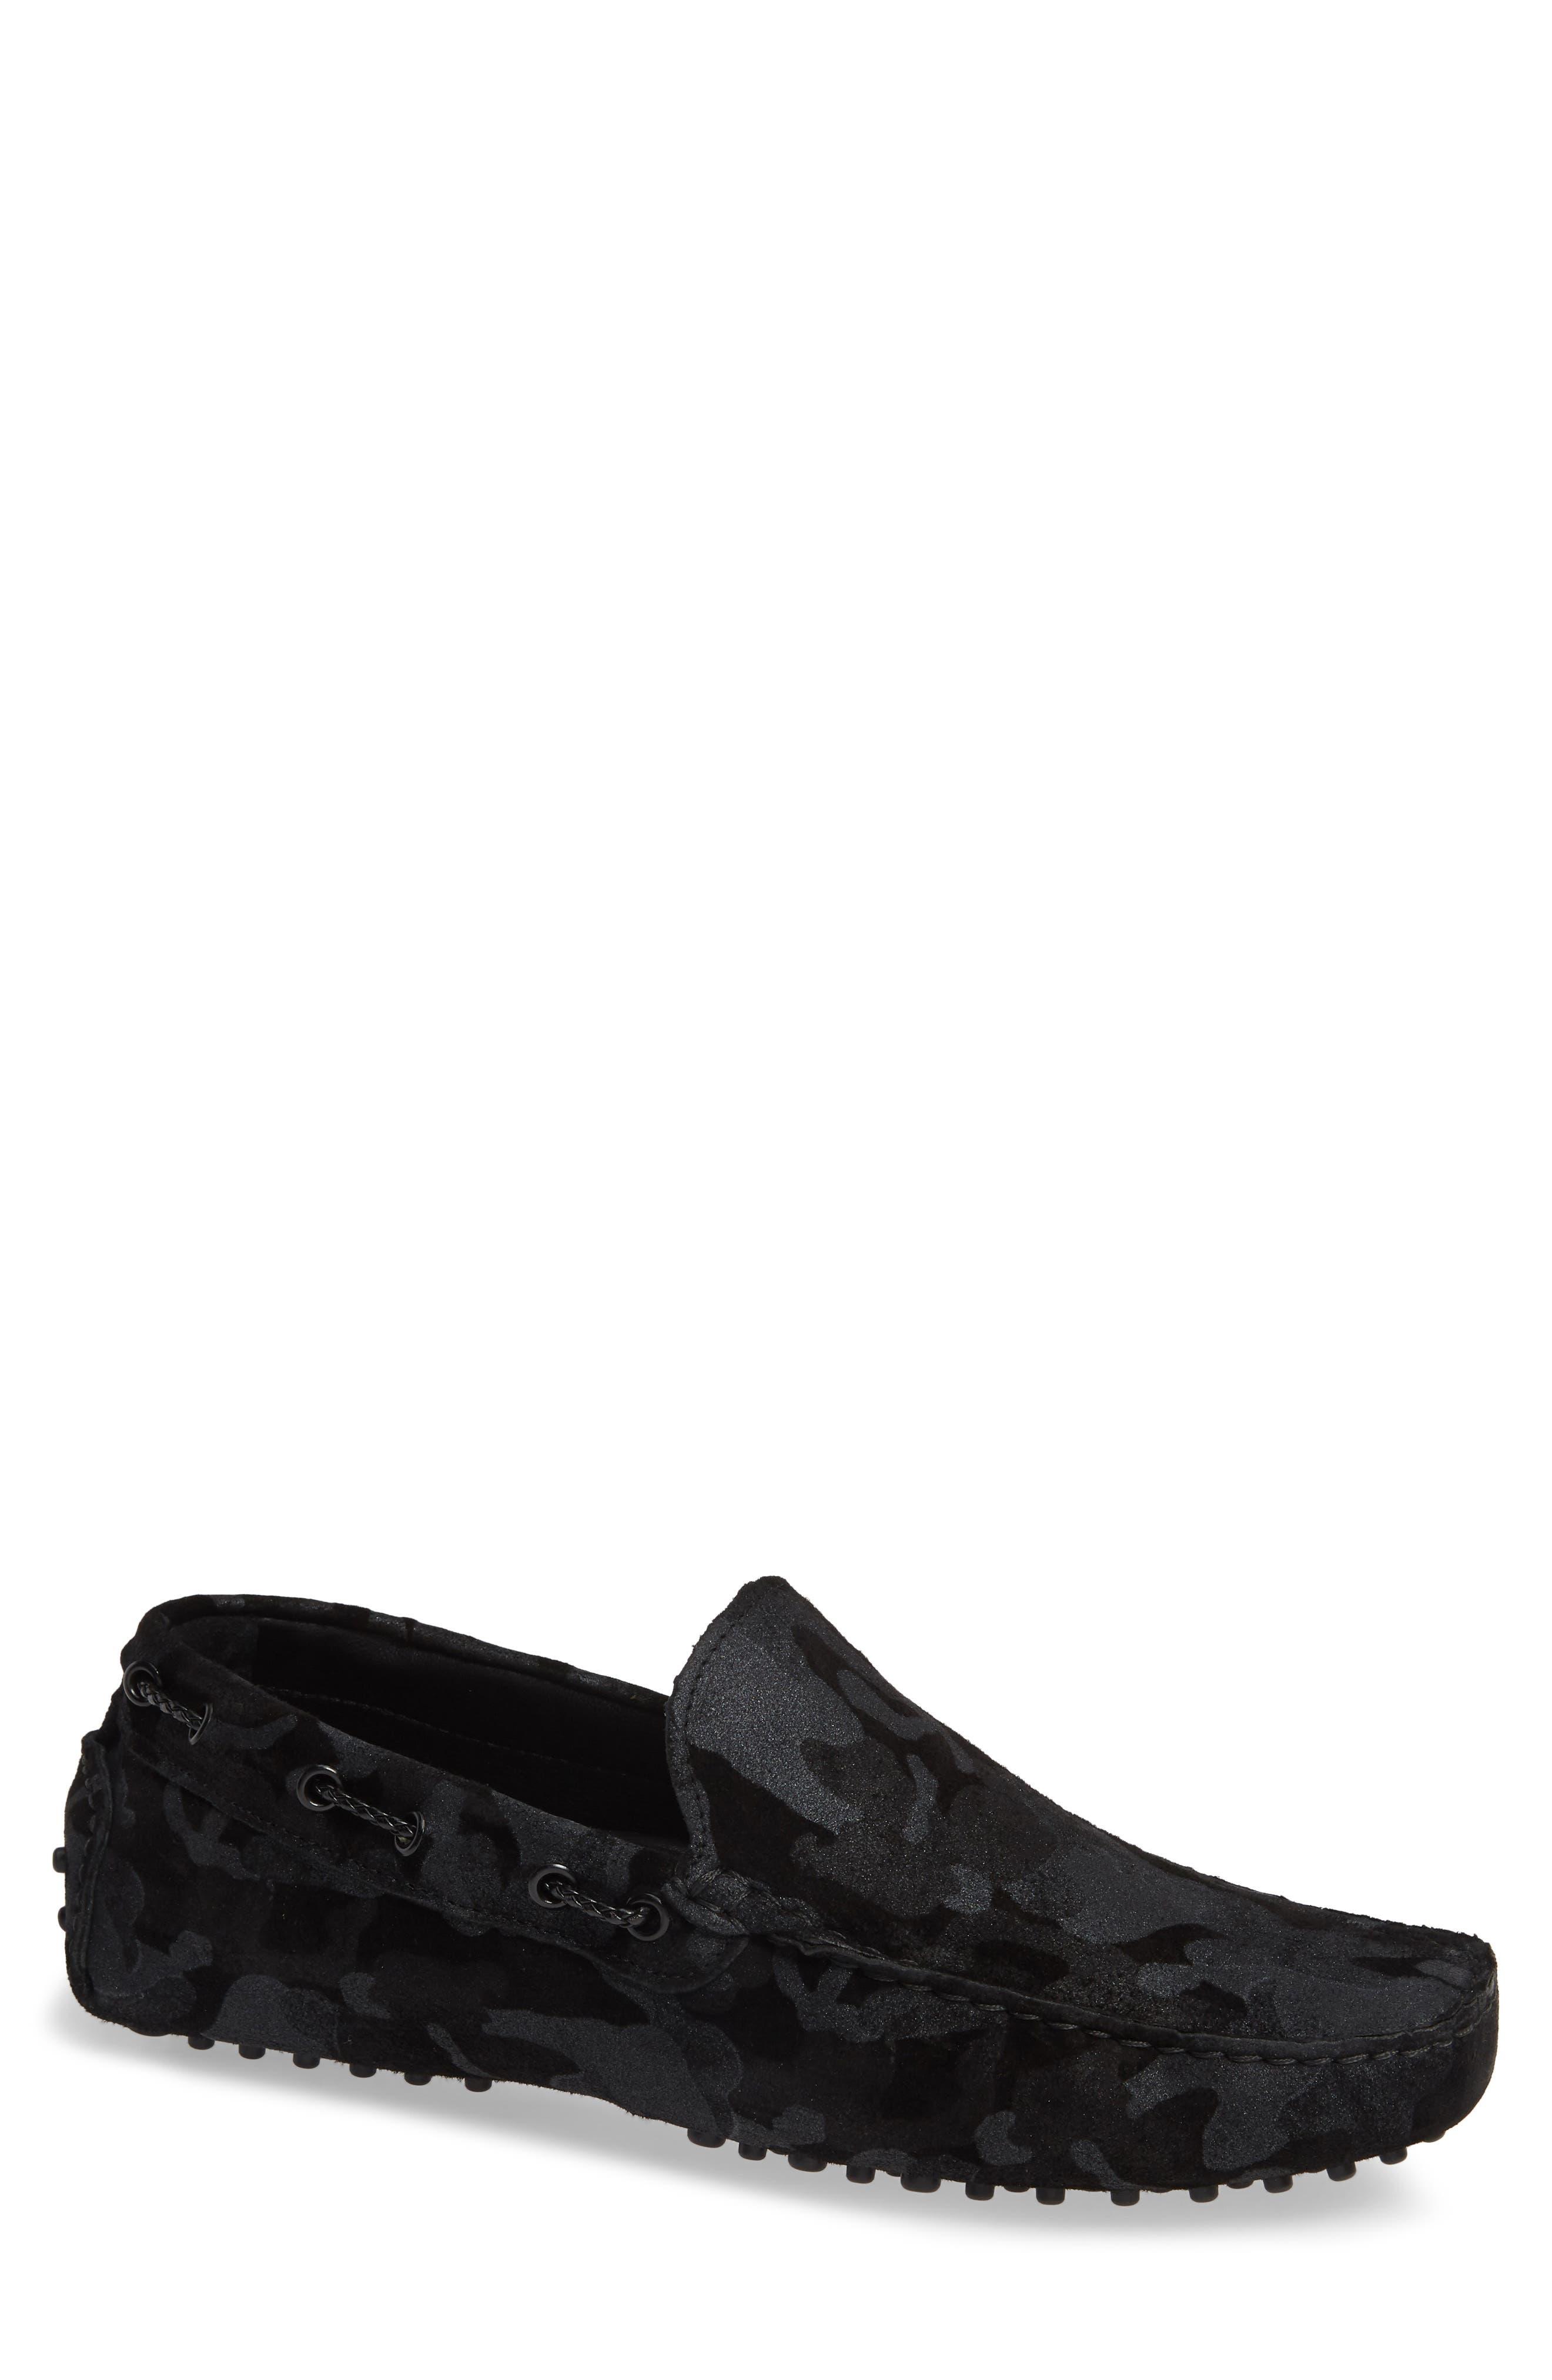 Venice Driving Shoe,                             Main thumbnail 1, color,                             BLACK CAMO